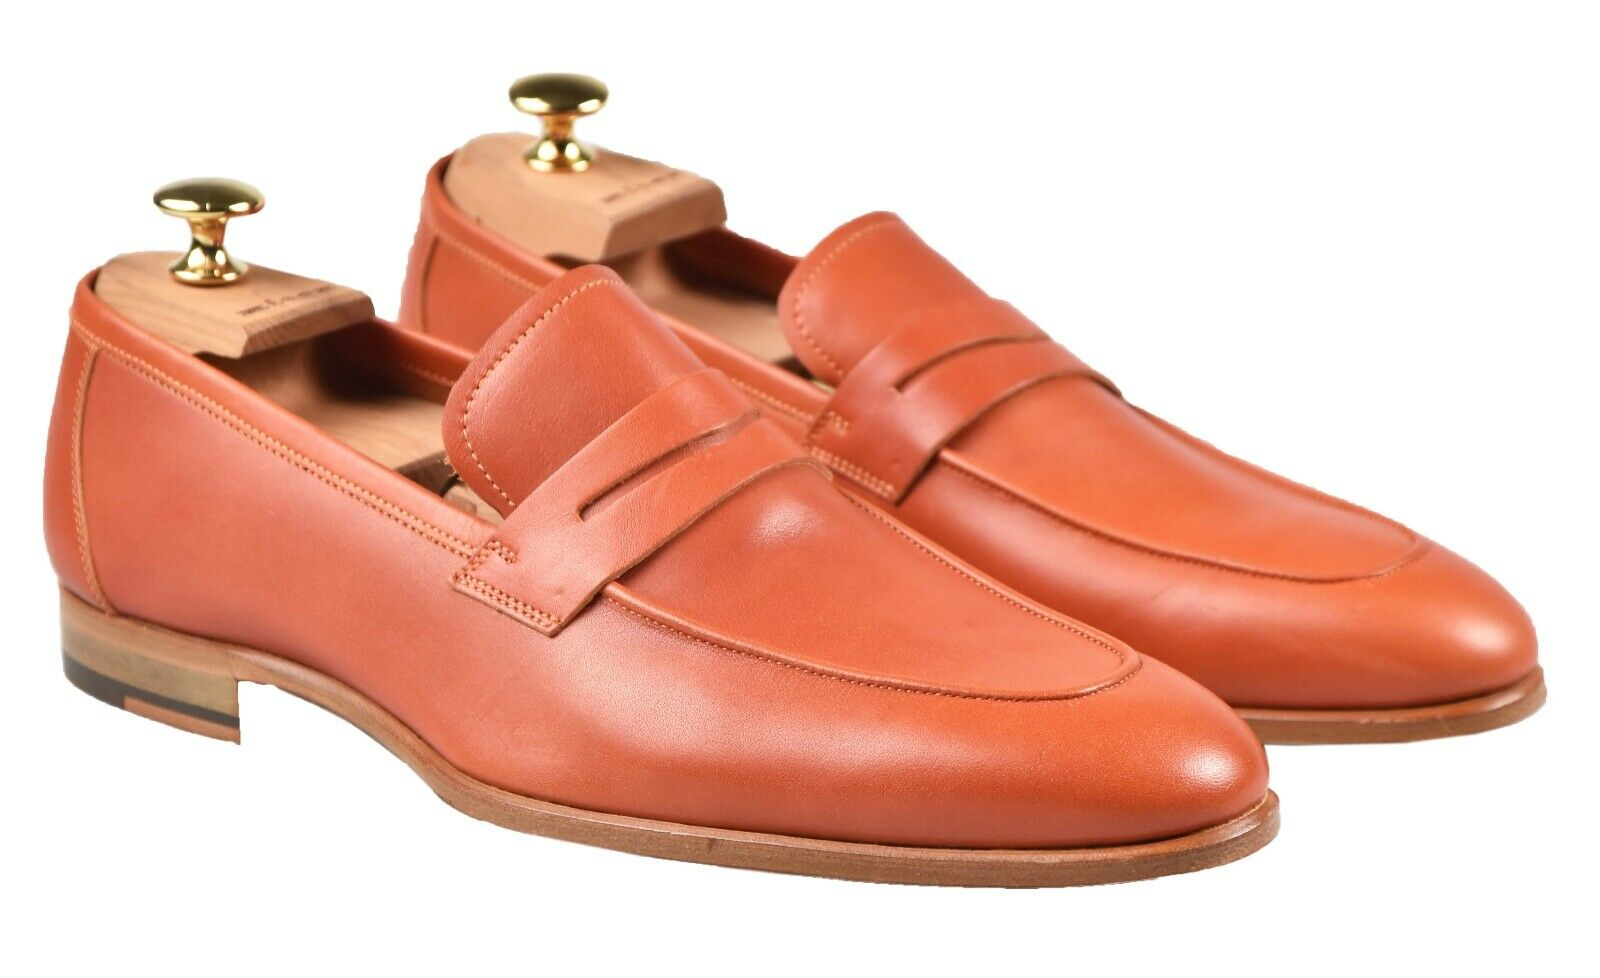 NEW KITON DRESS scarpe 100% LEATHER SZ 8 US 41 EU 19O116